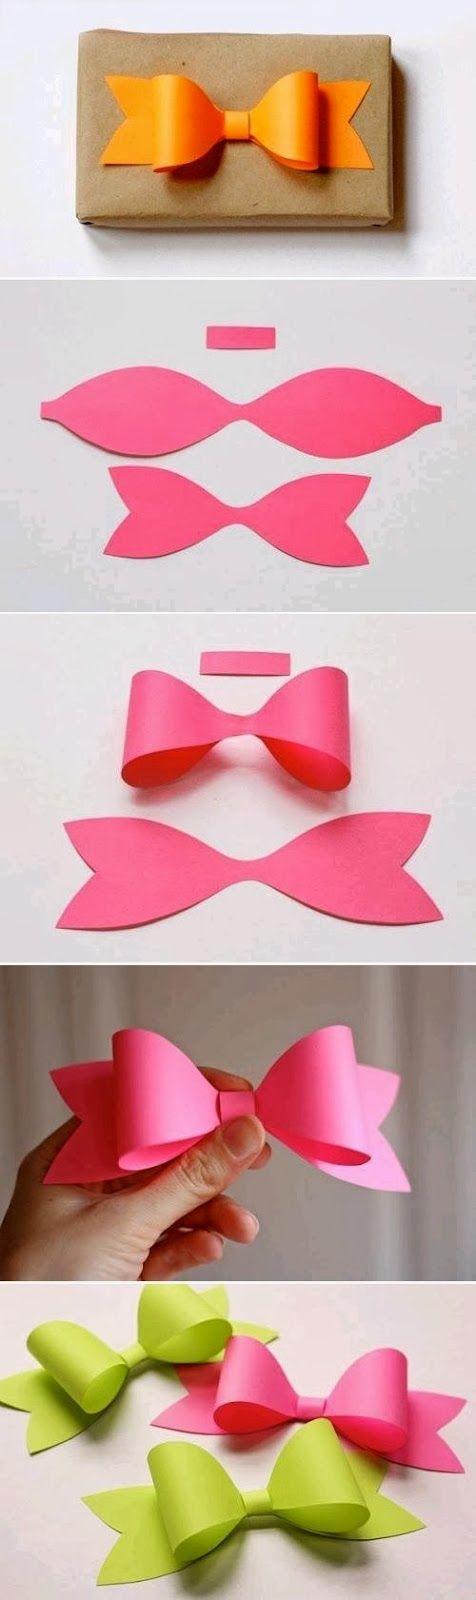 DIY Modular Gift Bow